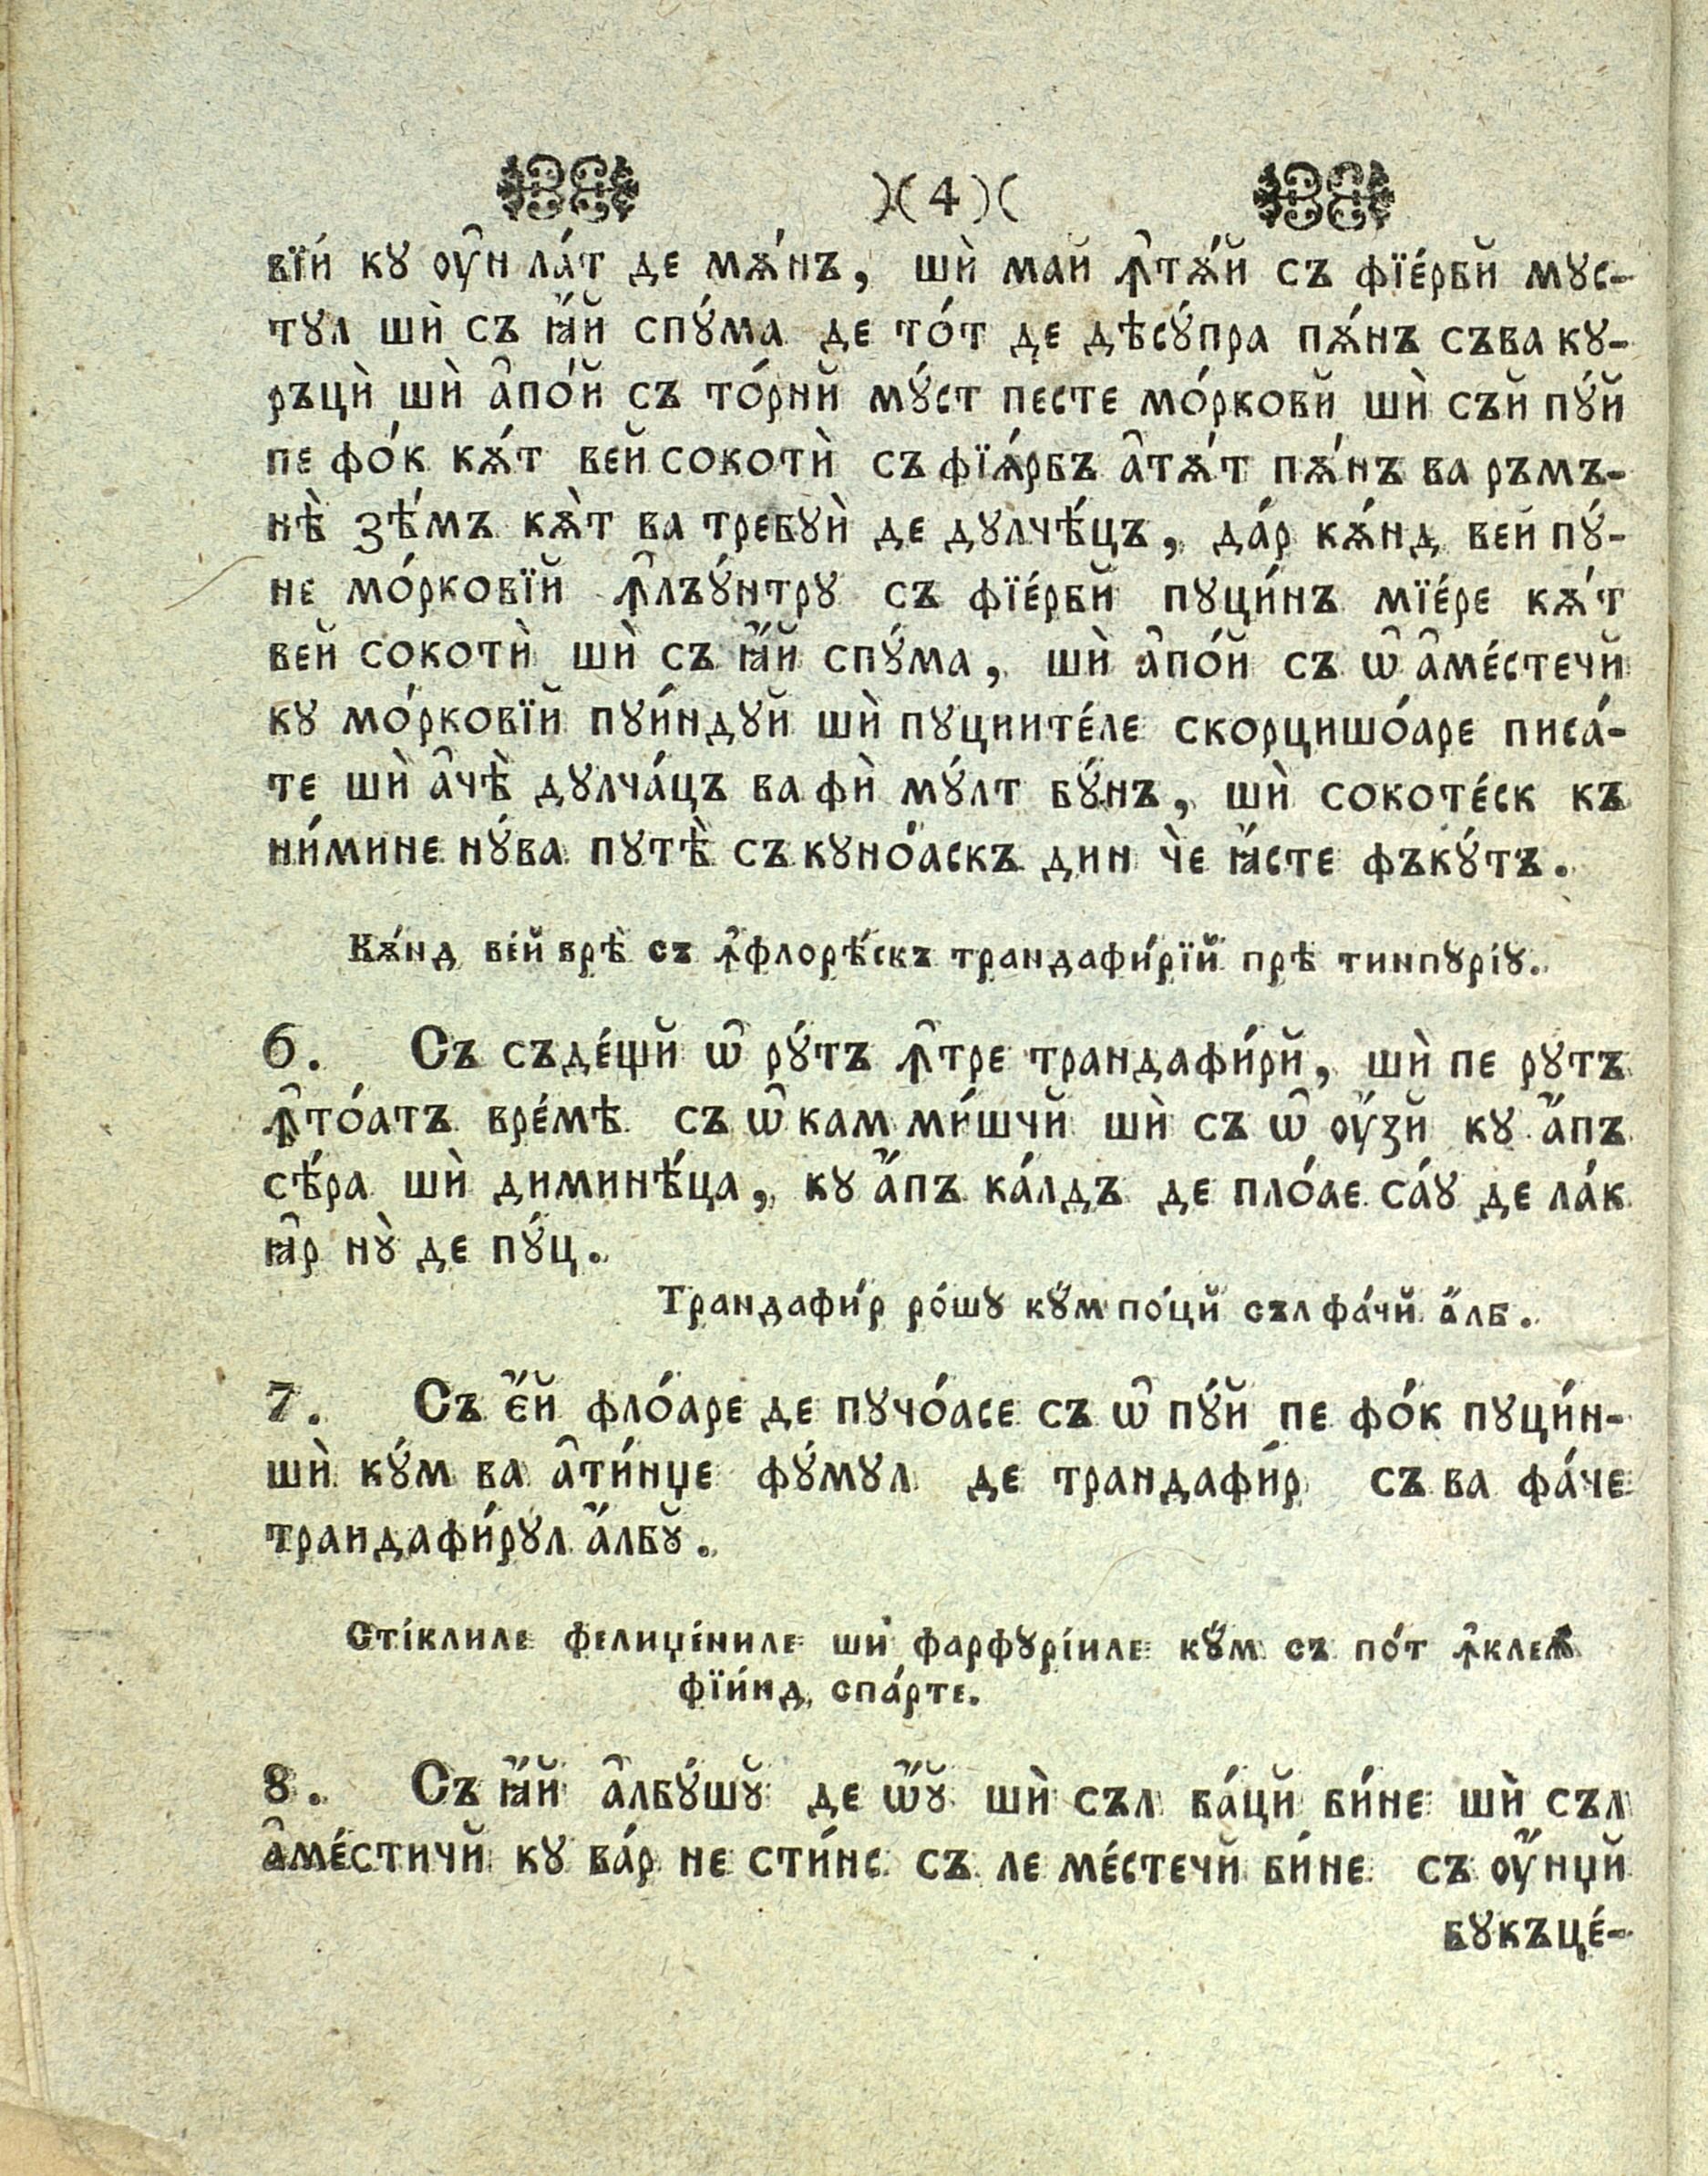 1806 p 20